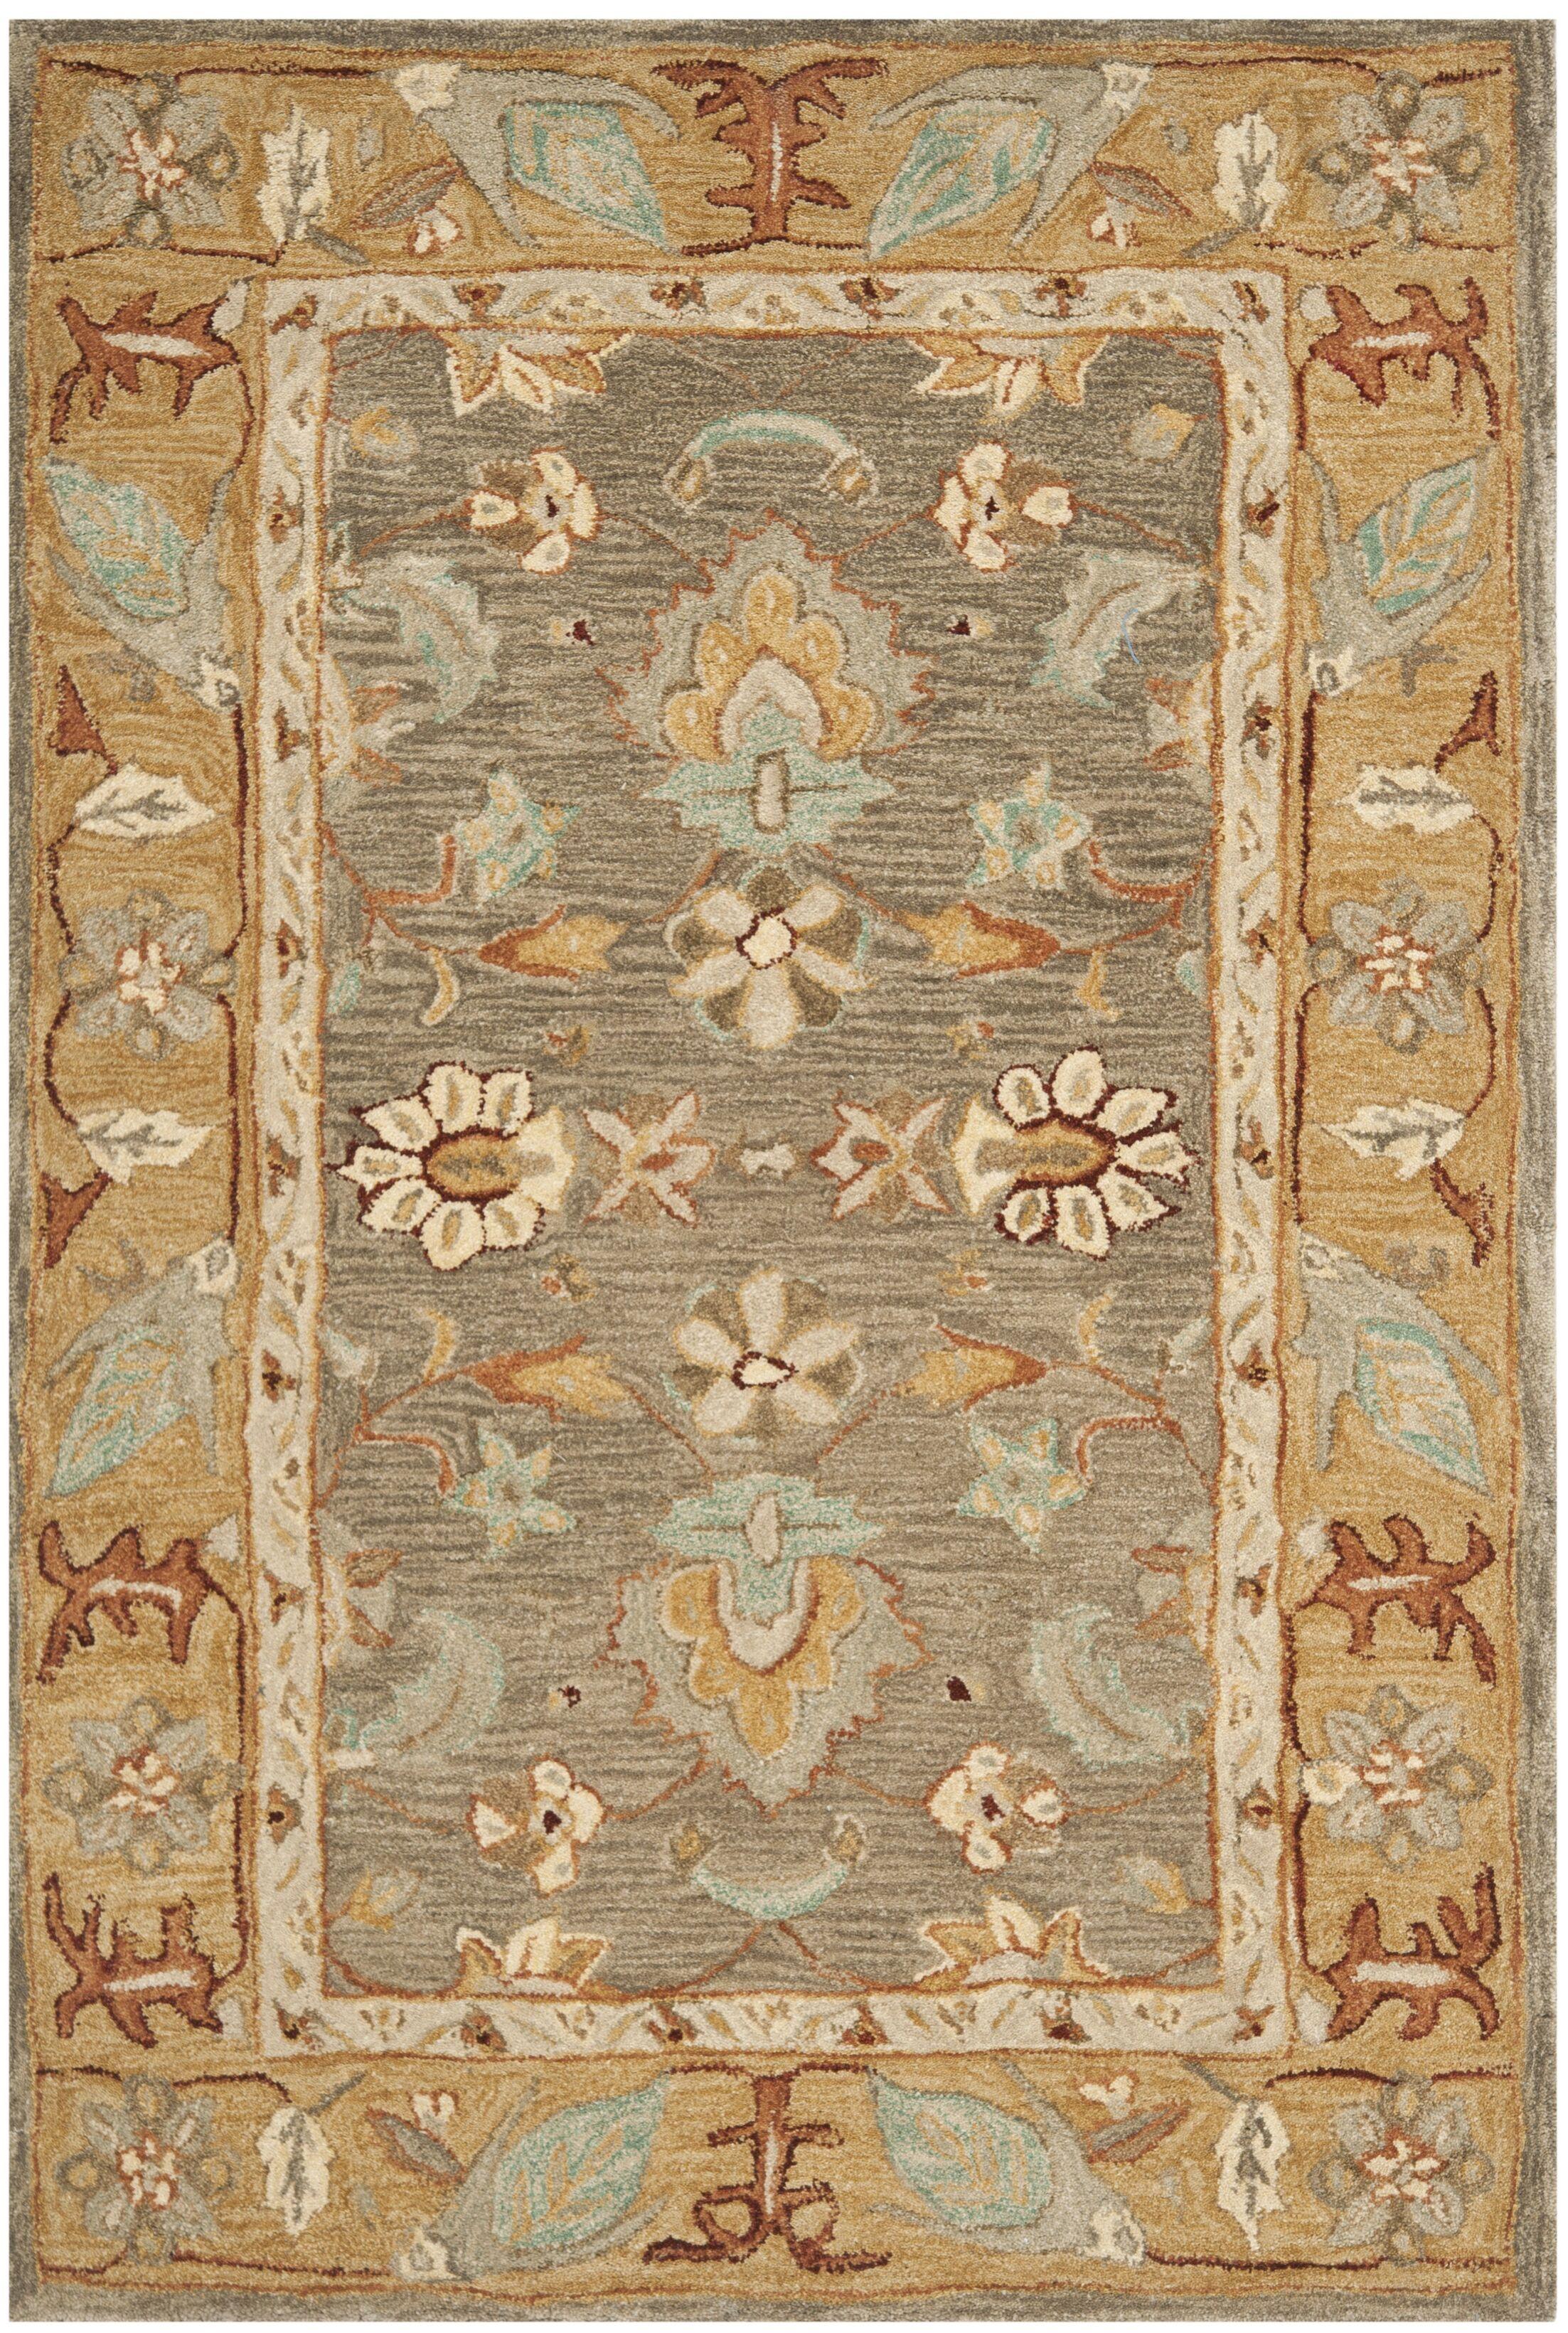 Anatolia Brown/Camel Area Rug Rug Size: Rectangle 6' x 9'